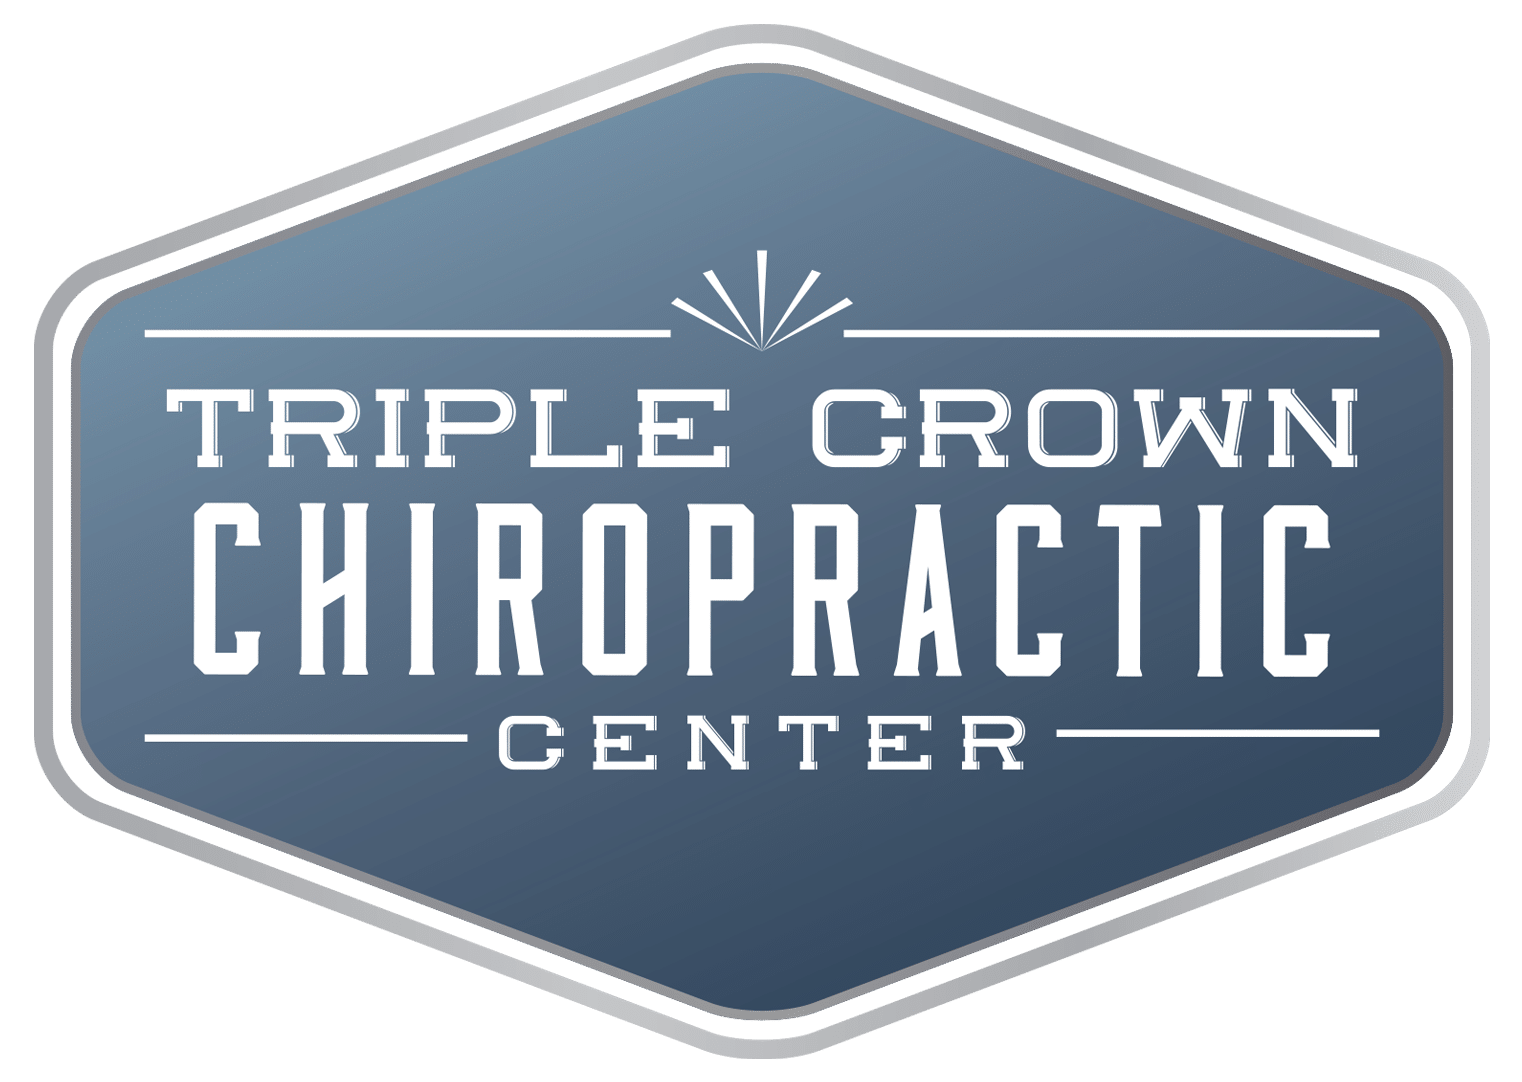 Triple Crown Chiropractic